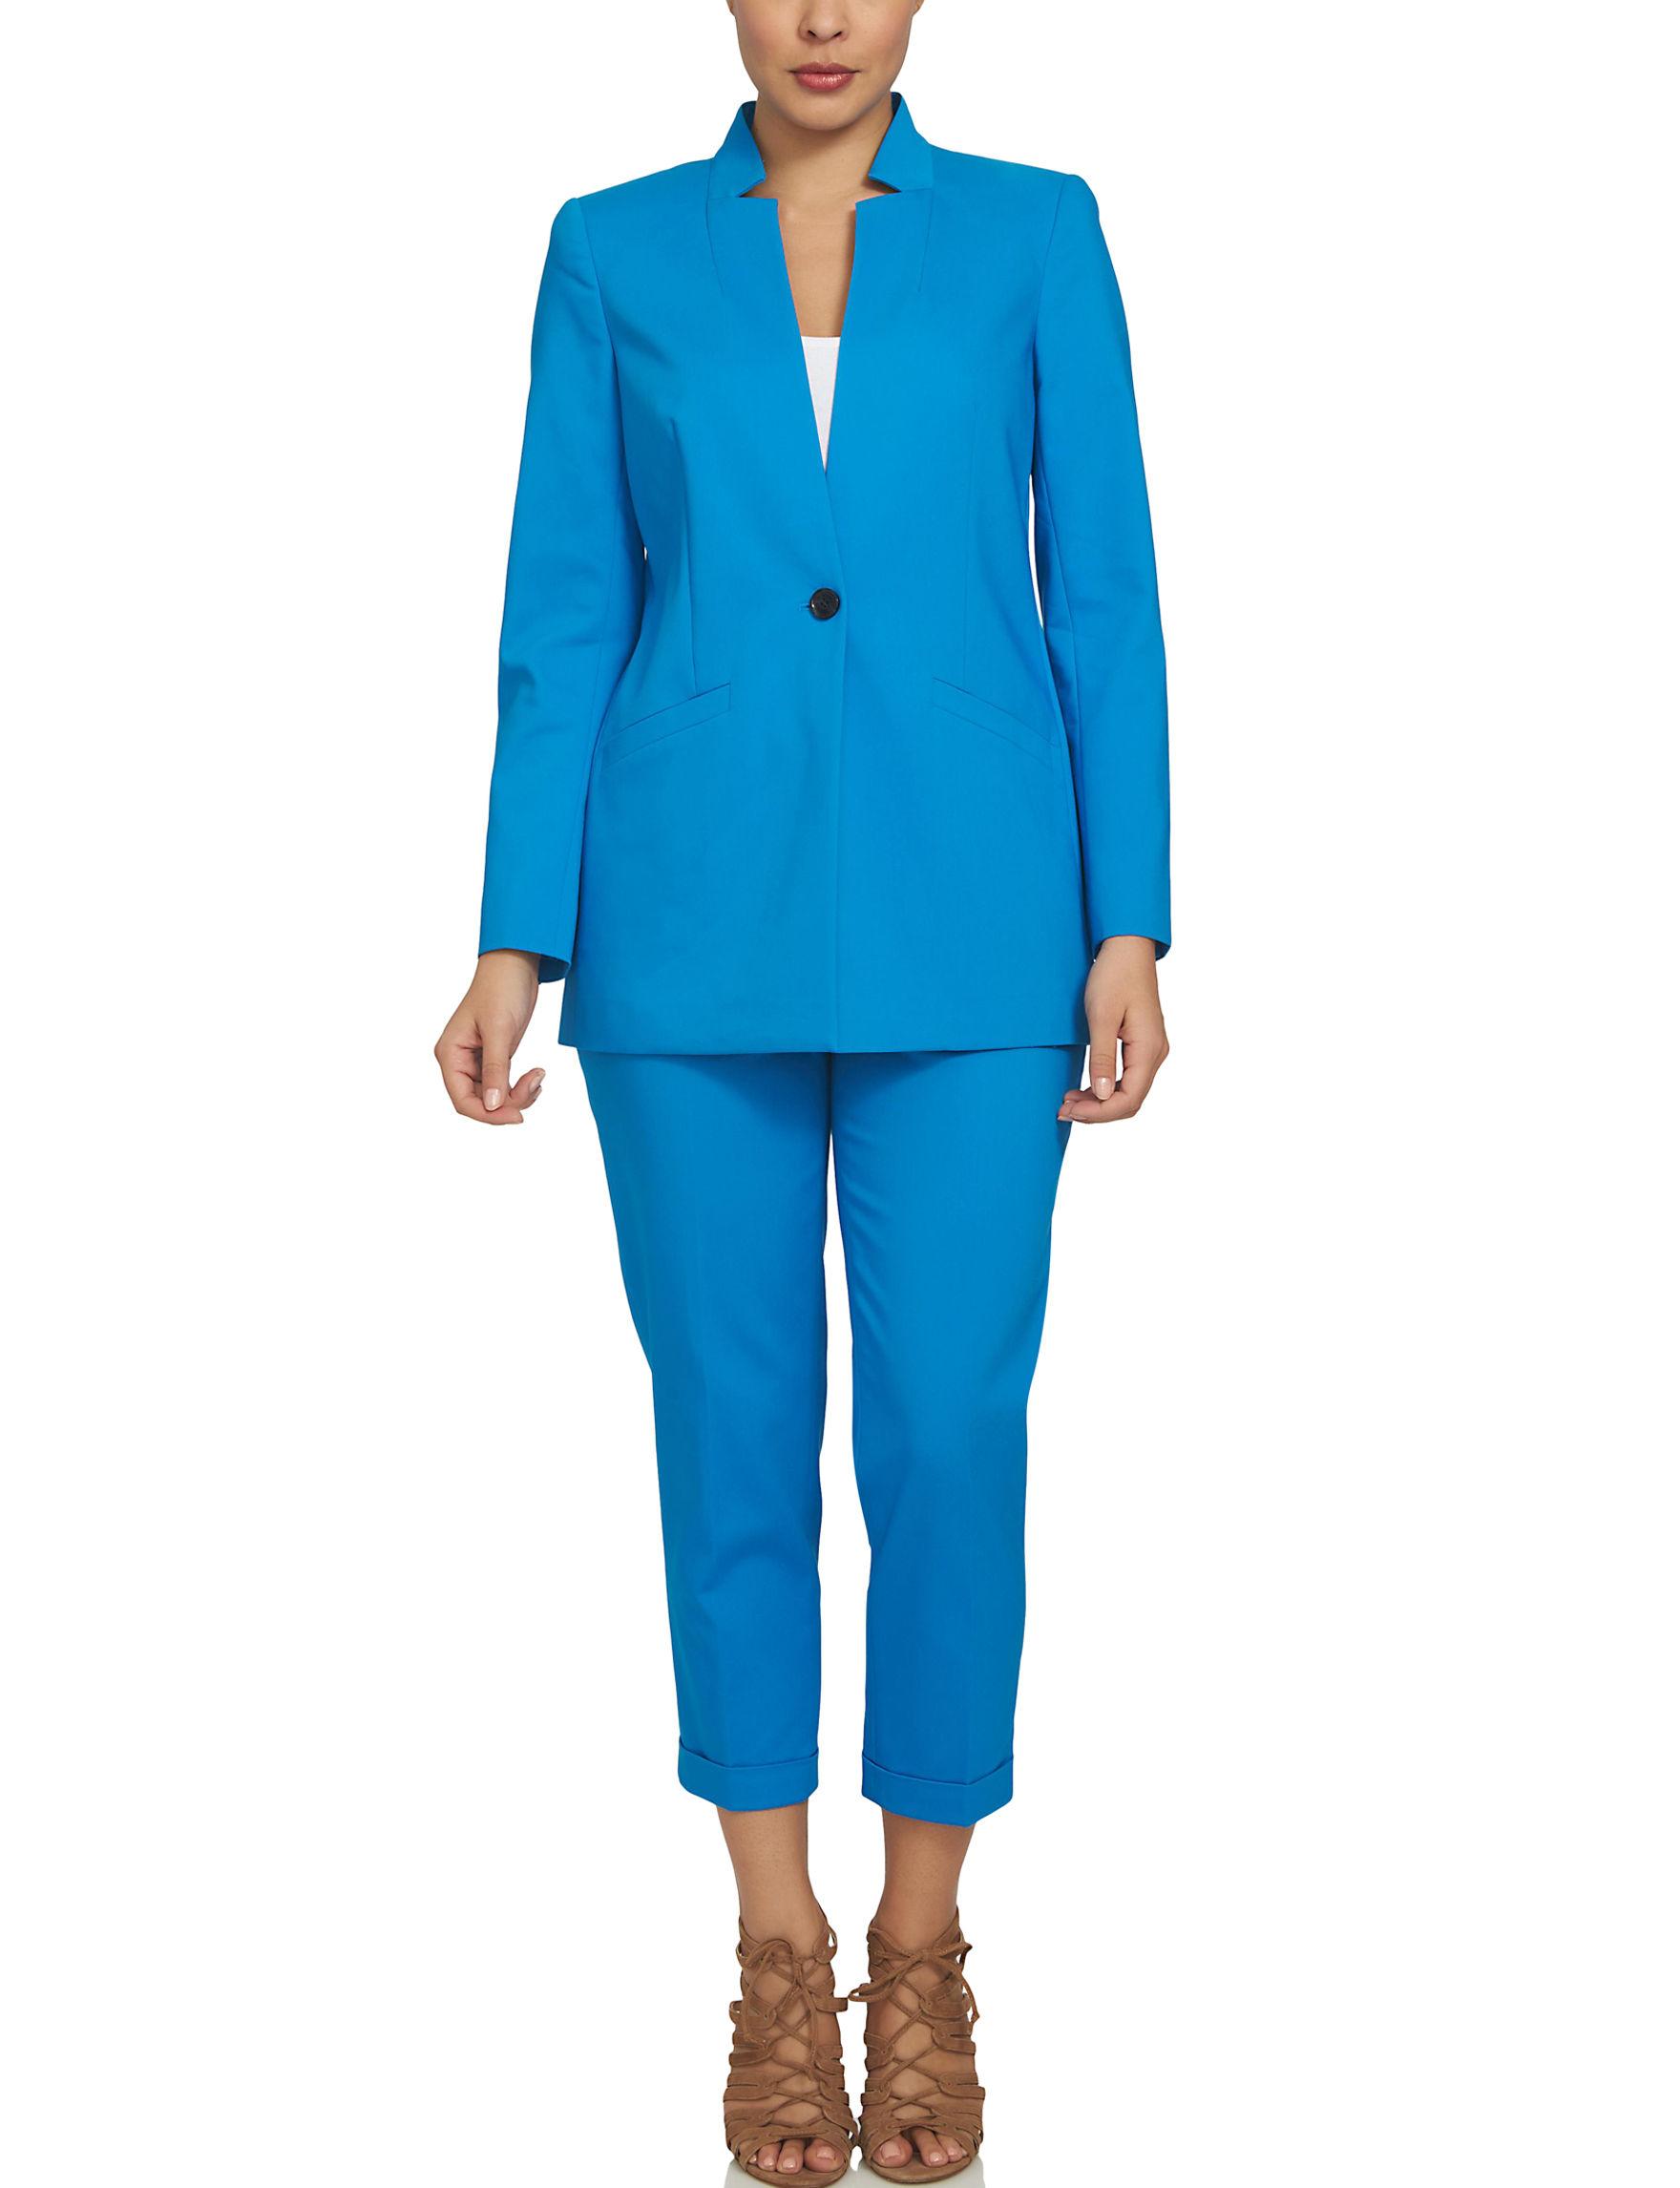 Chaus Blue Lightweight Jackets & Blazers